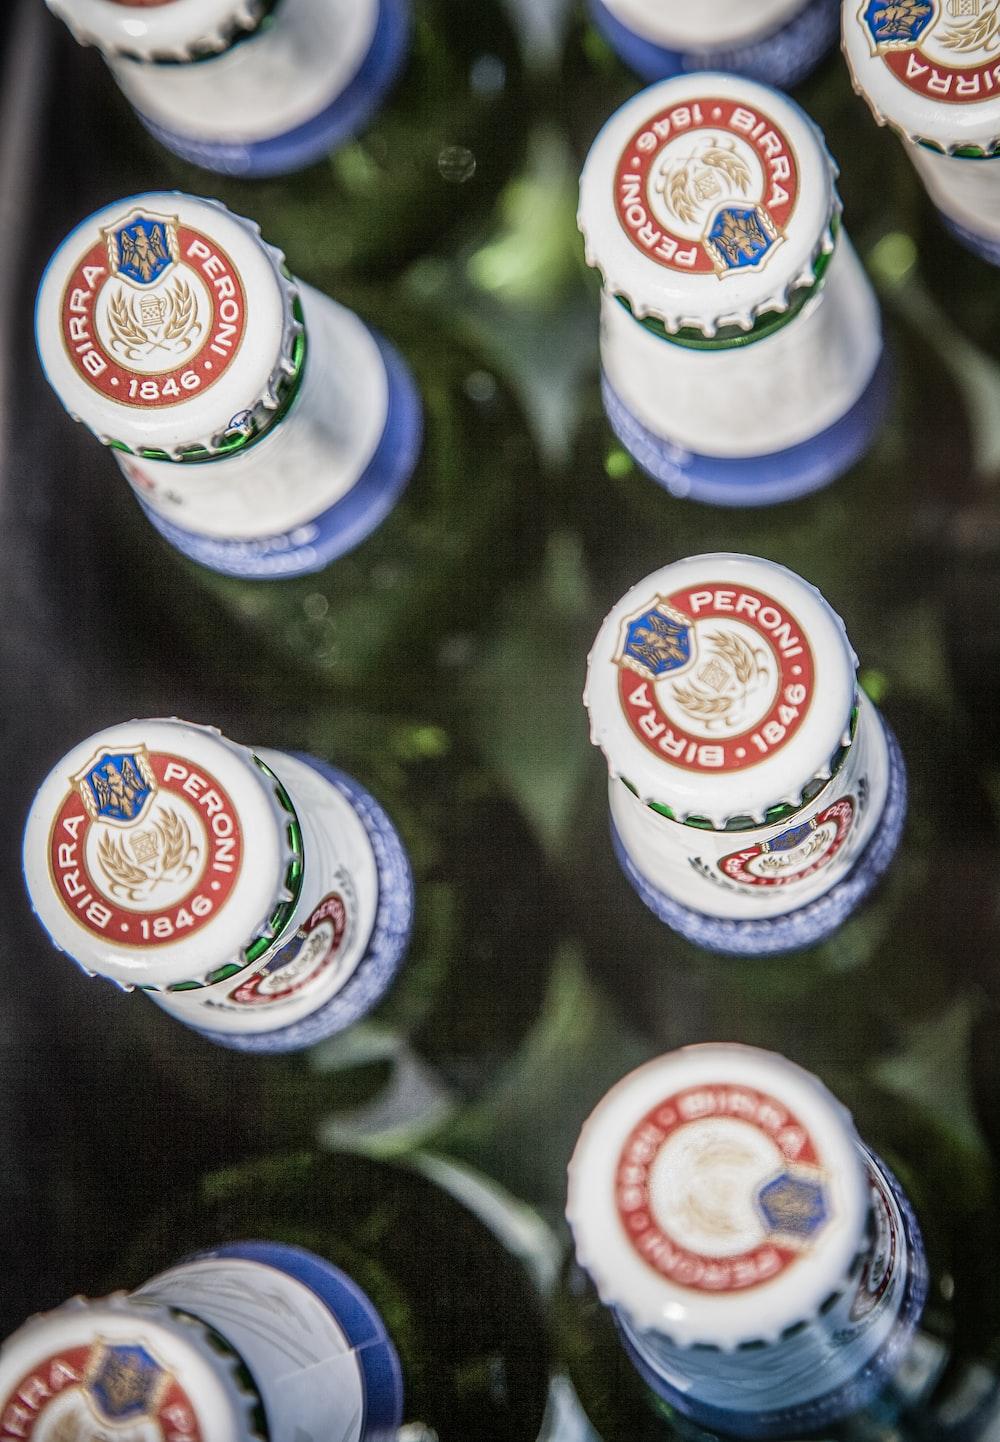 Peroni Birra drink bottle crowns